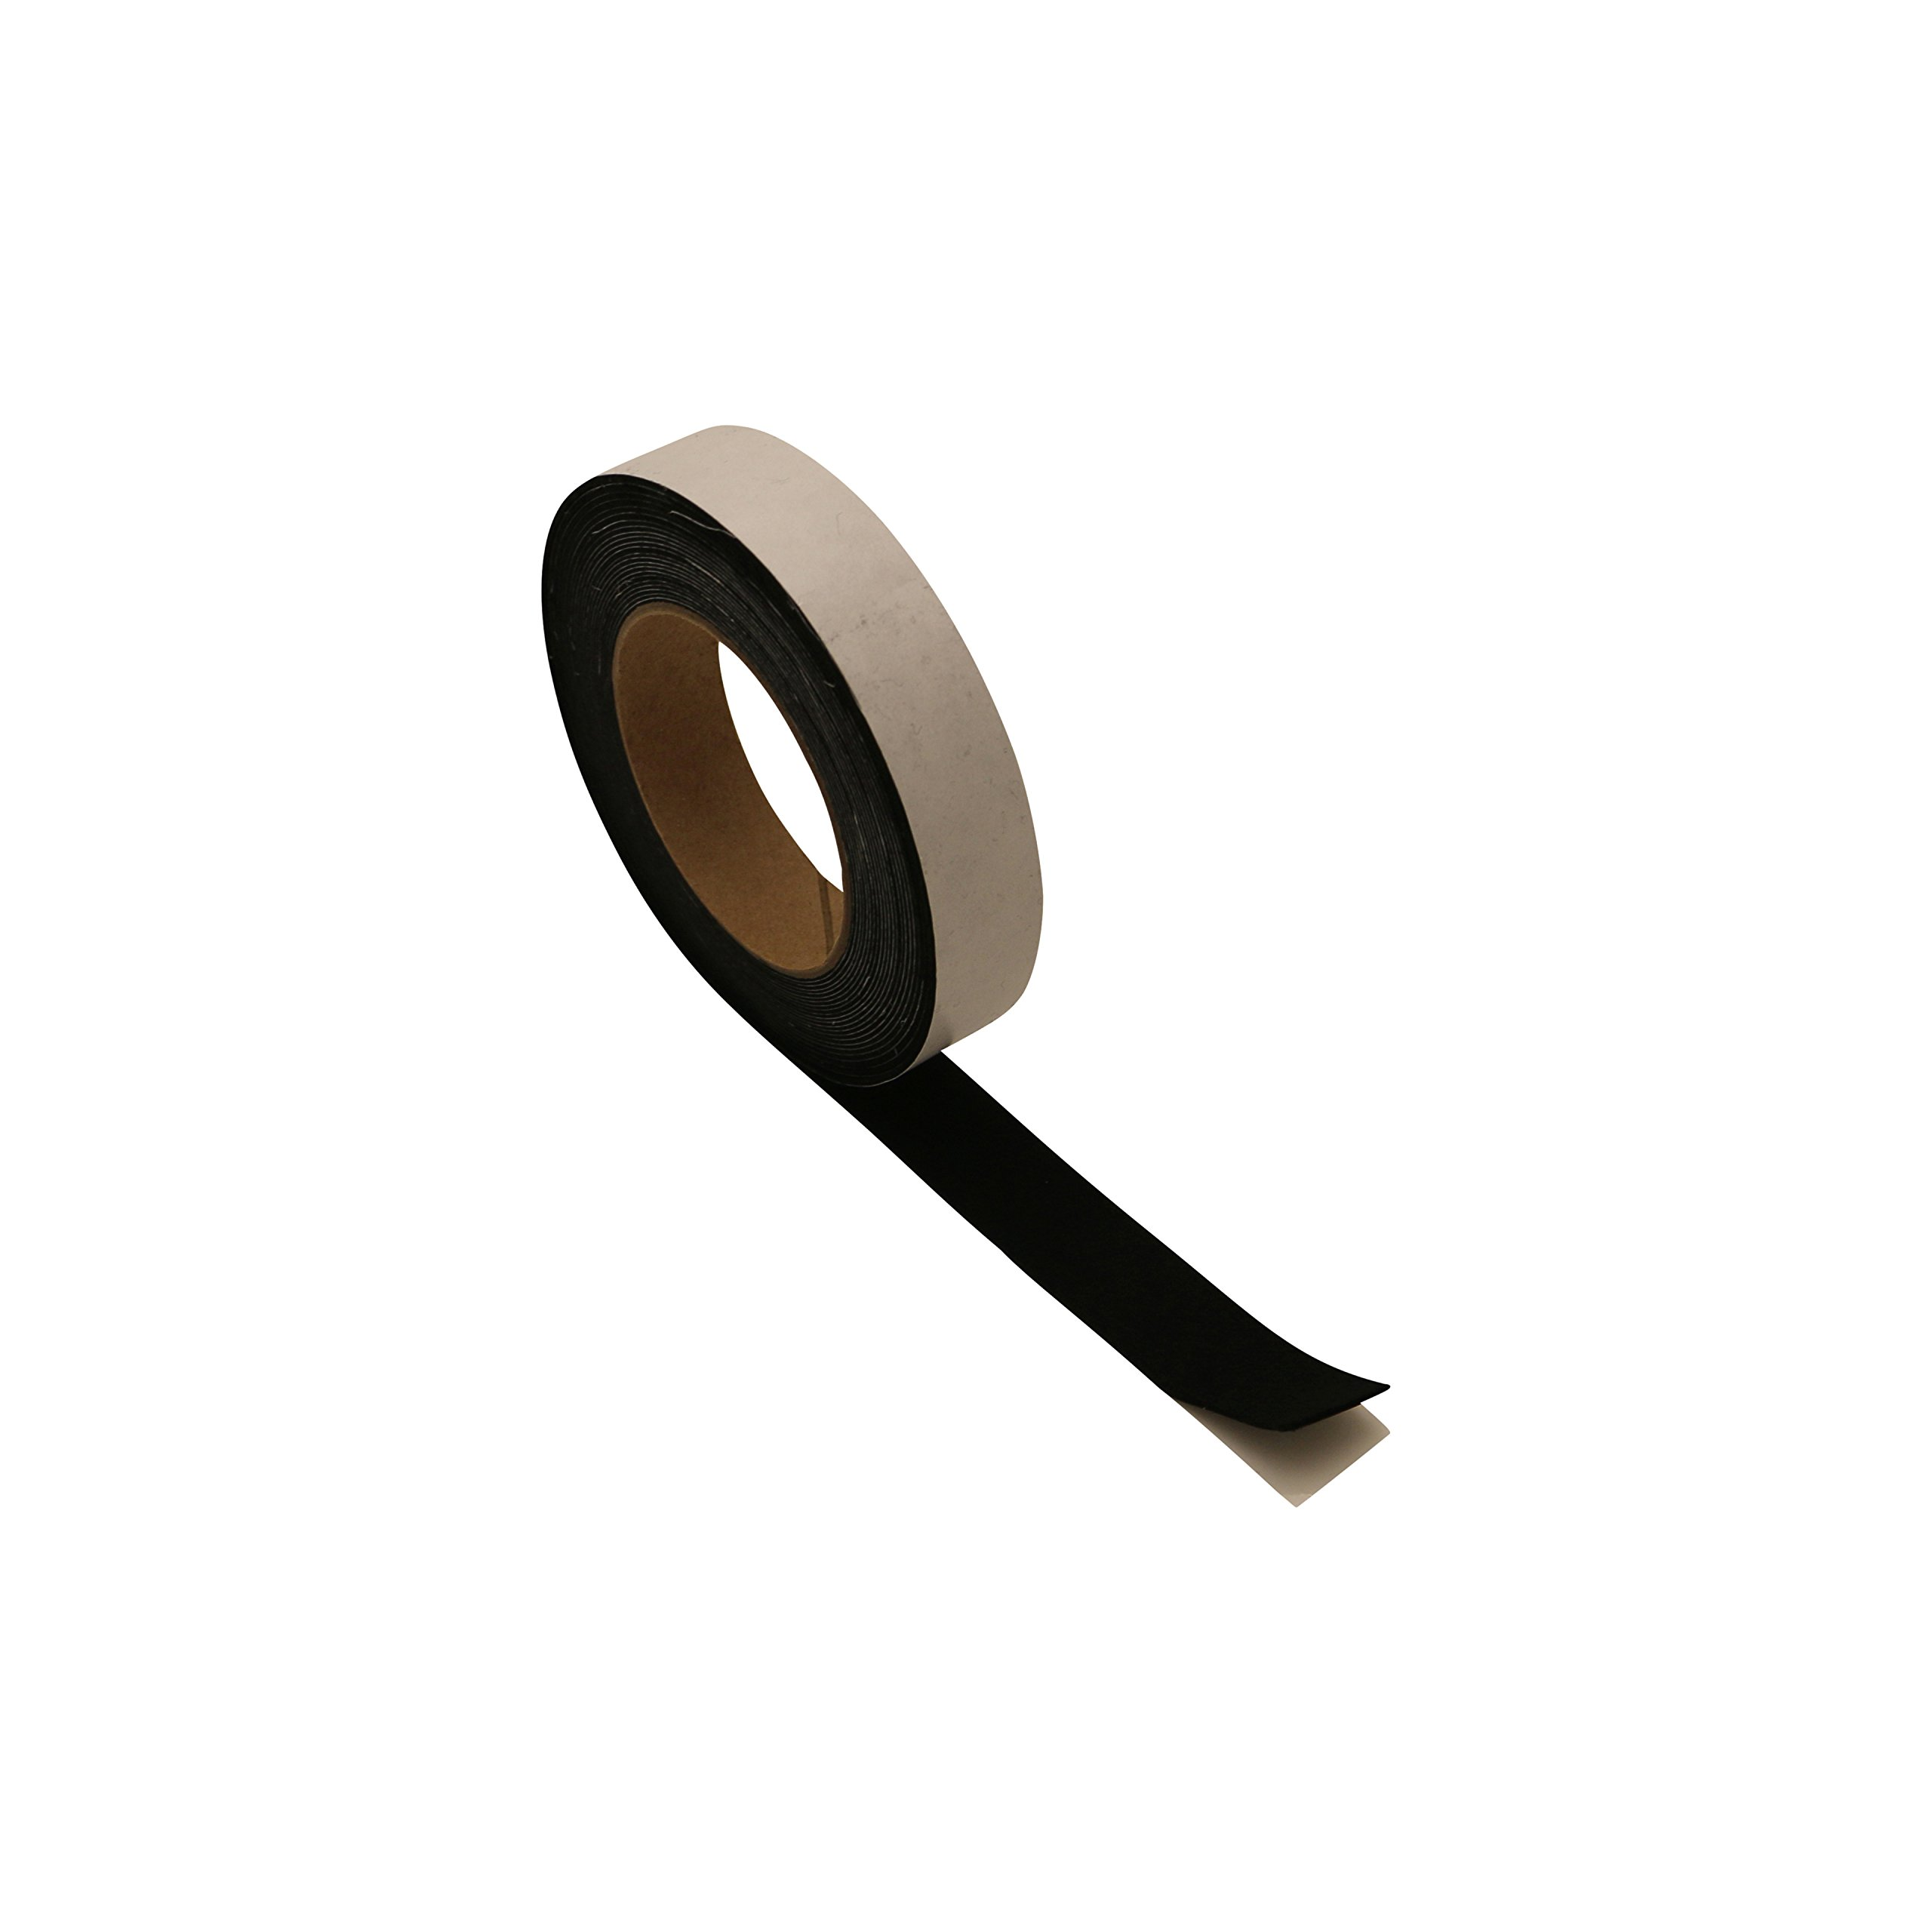 J.V. Converting ACF-06/BLK1833 JVCC ACF-06 Acrylic Craft Felt Tape: 1'' x 25 ft, black